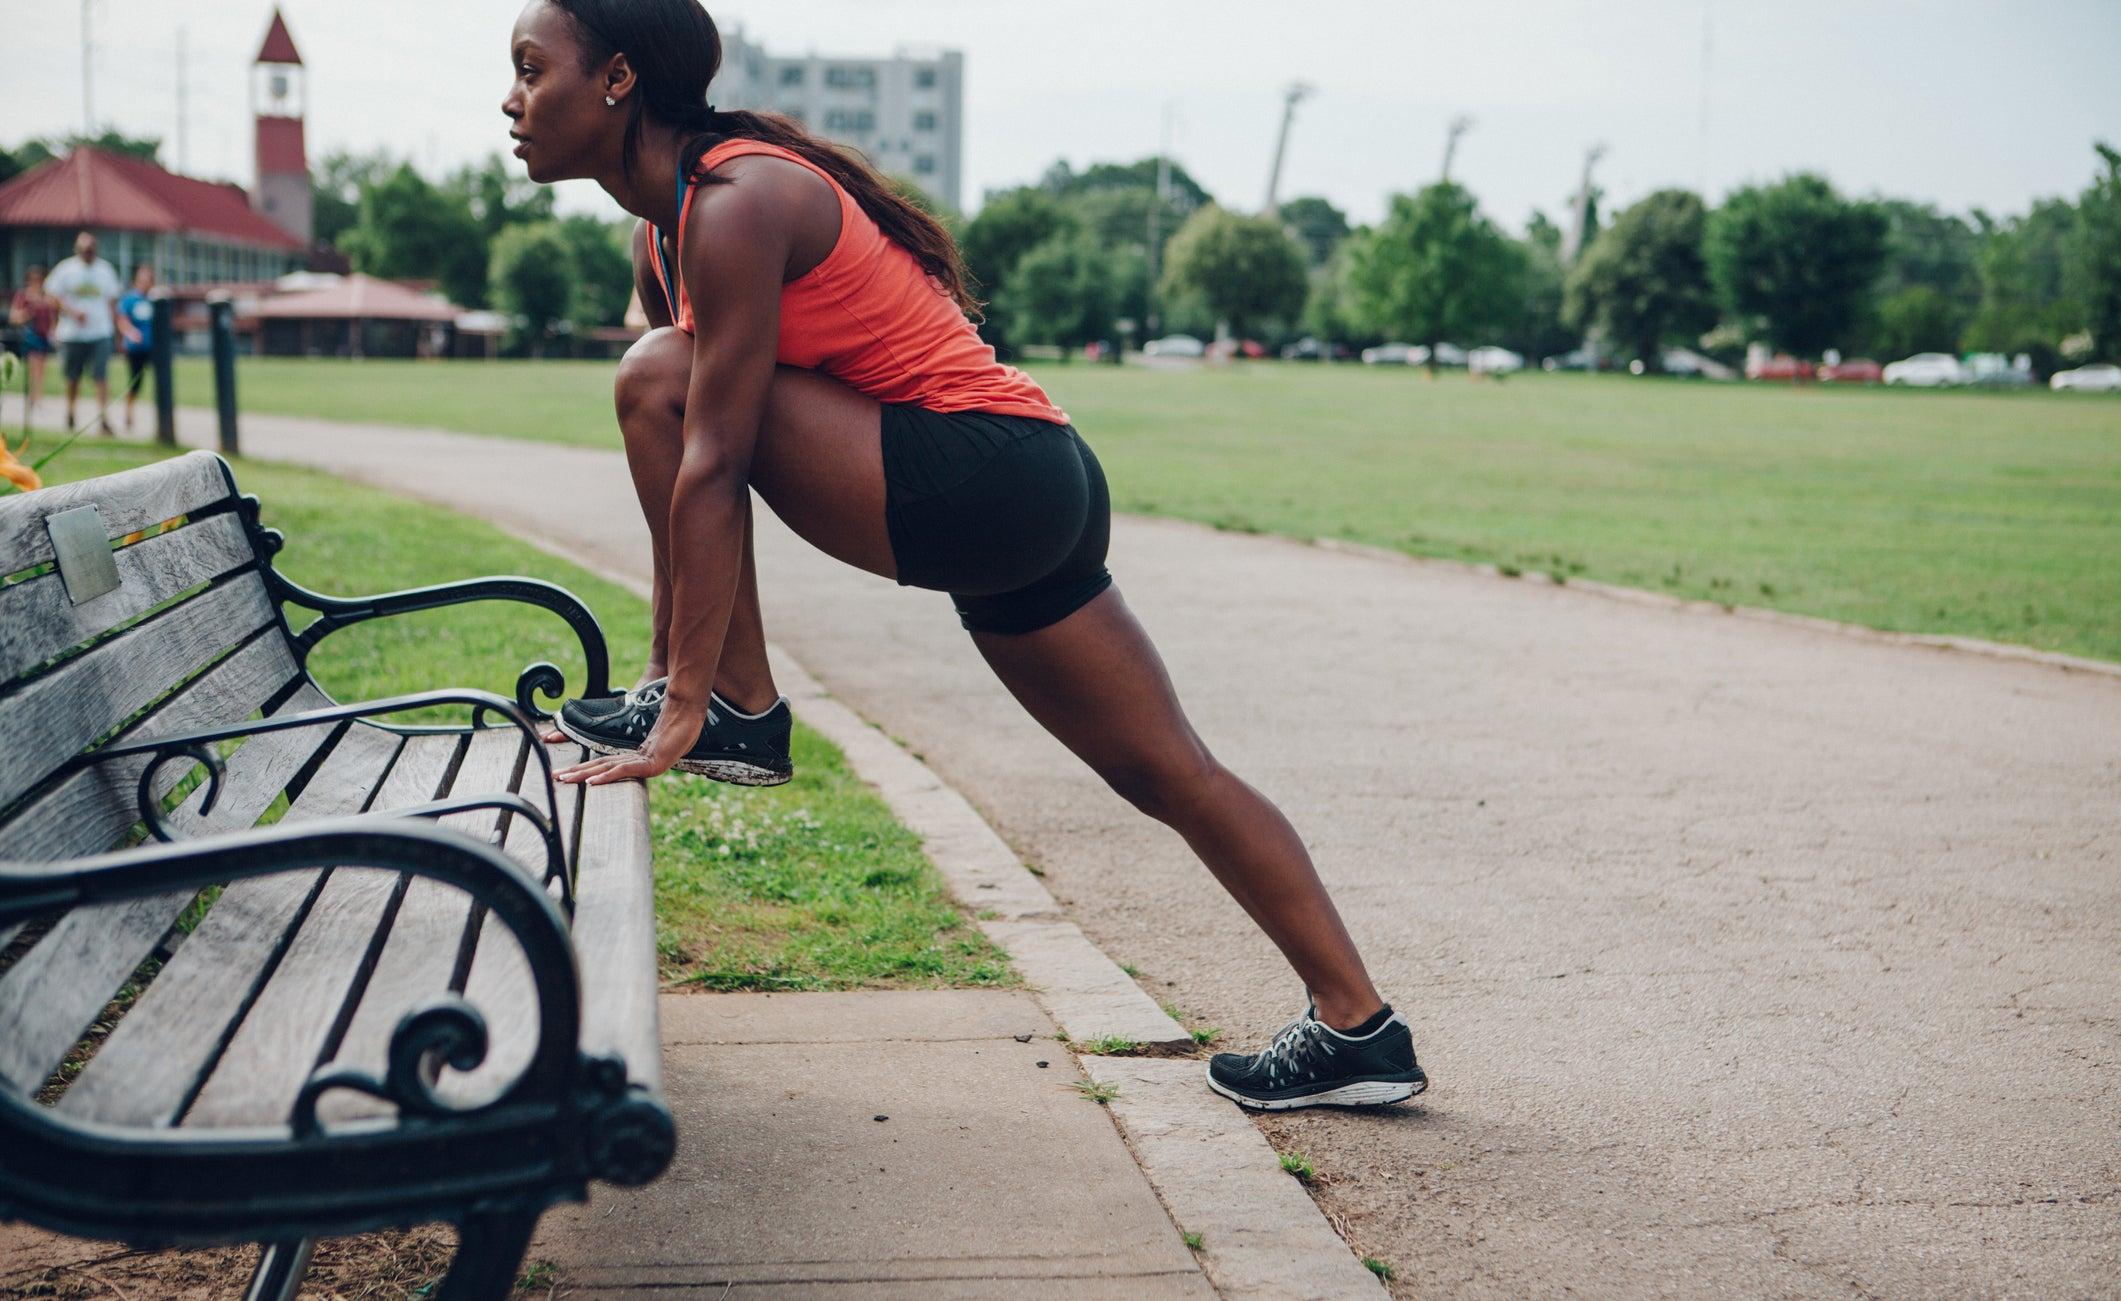 Piedmont Park run in Atlanta